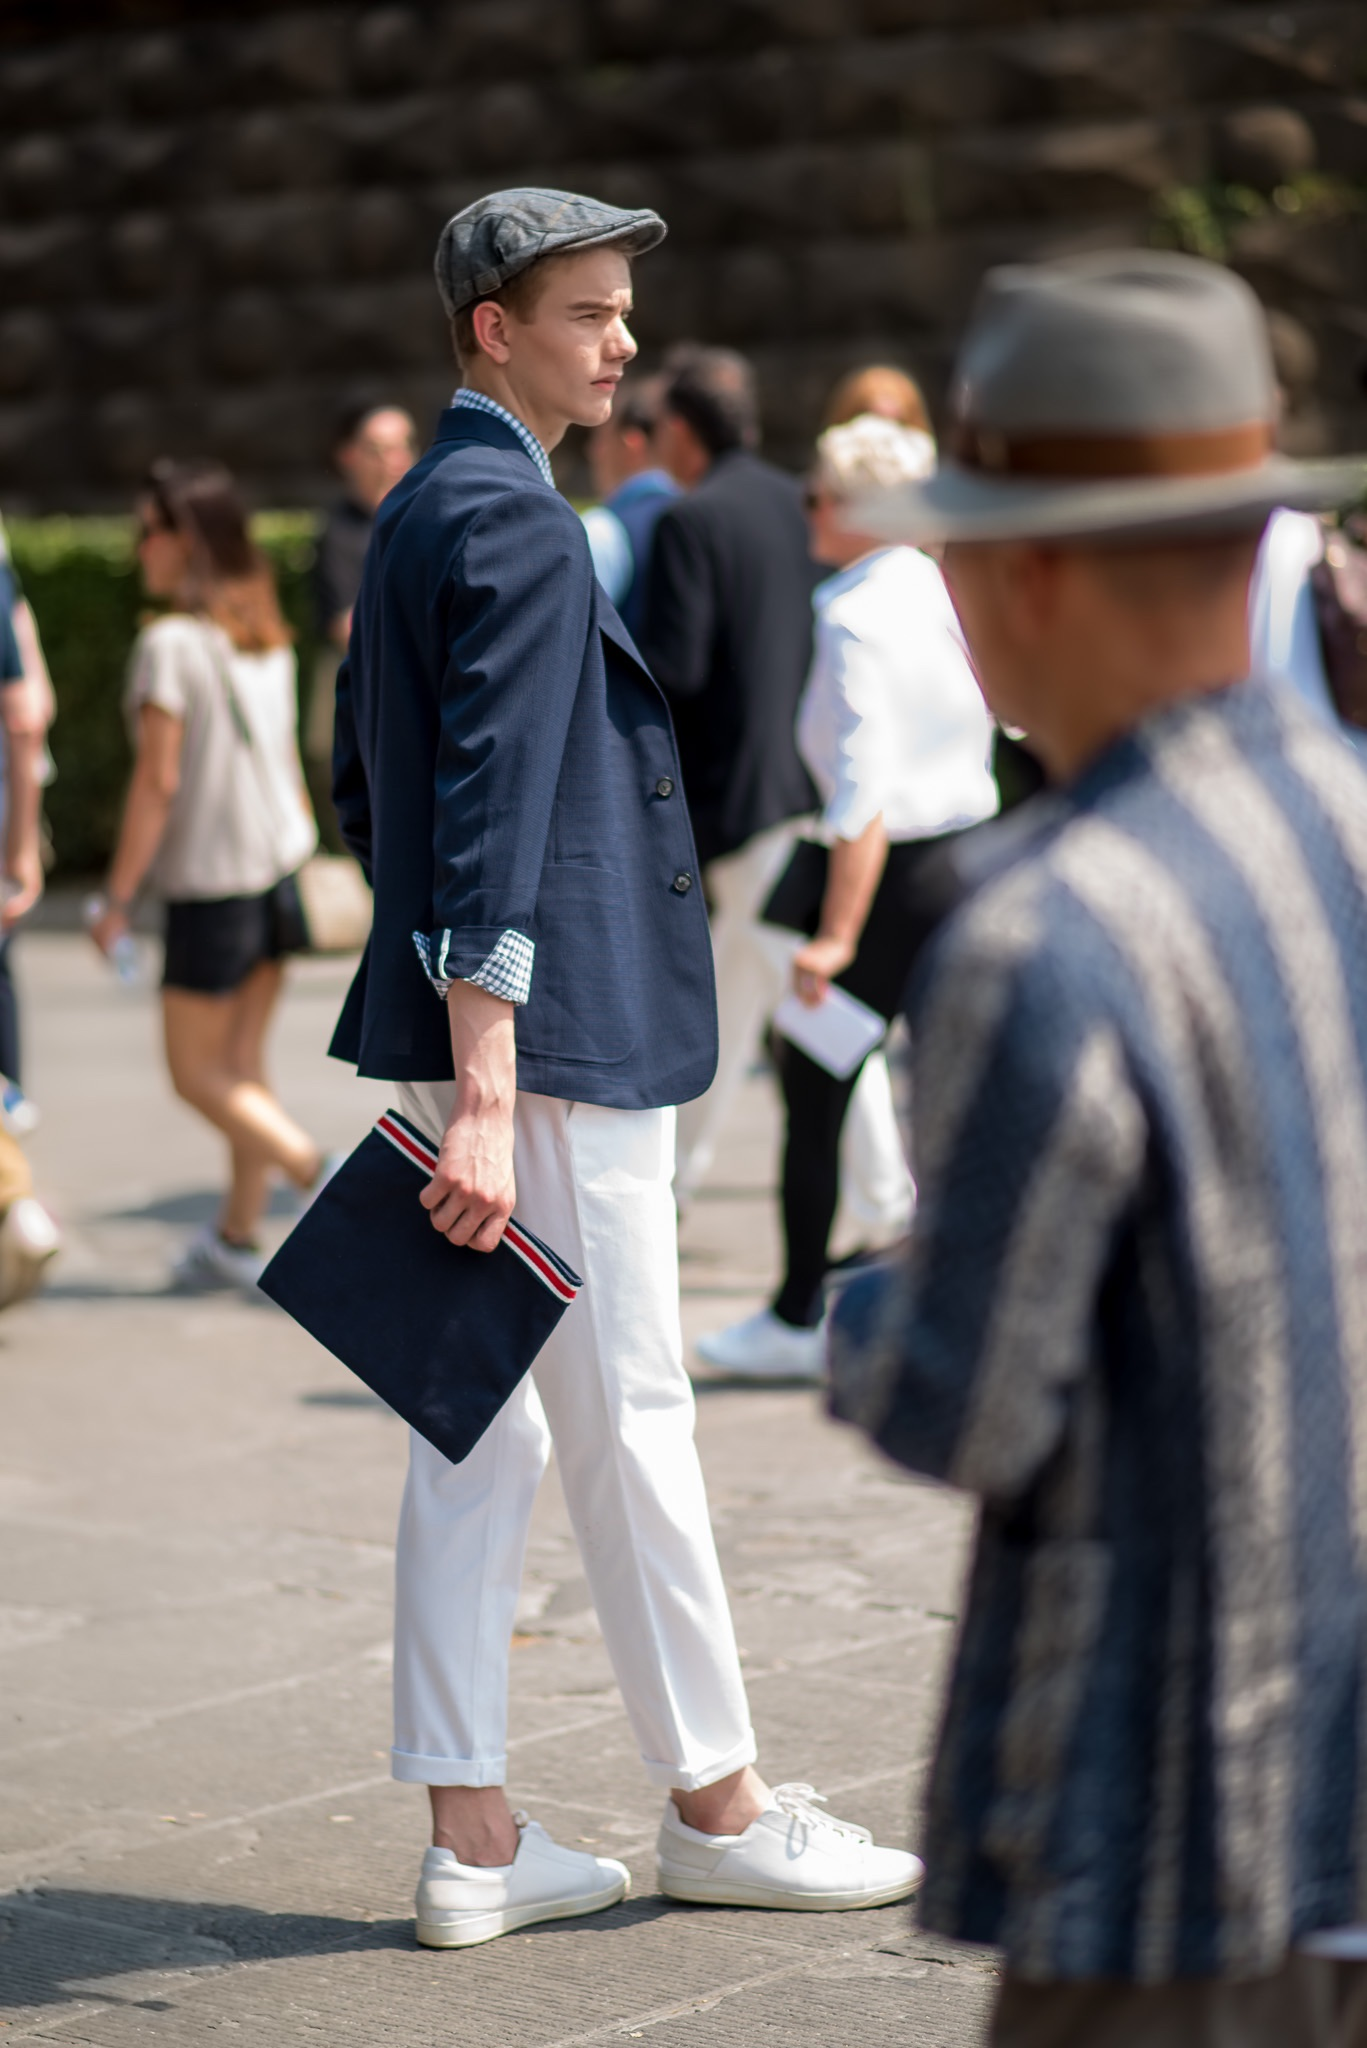 Street Style Pitti Uomo Florence June 2017 Photography Annika Lagerqvist www.annikasomething.com